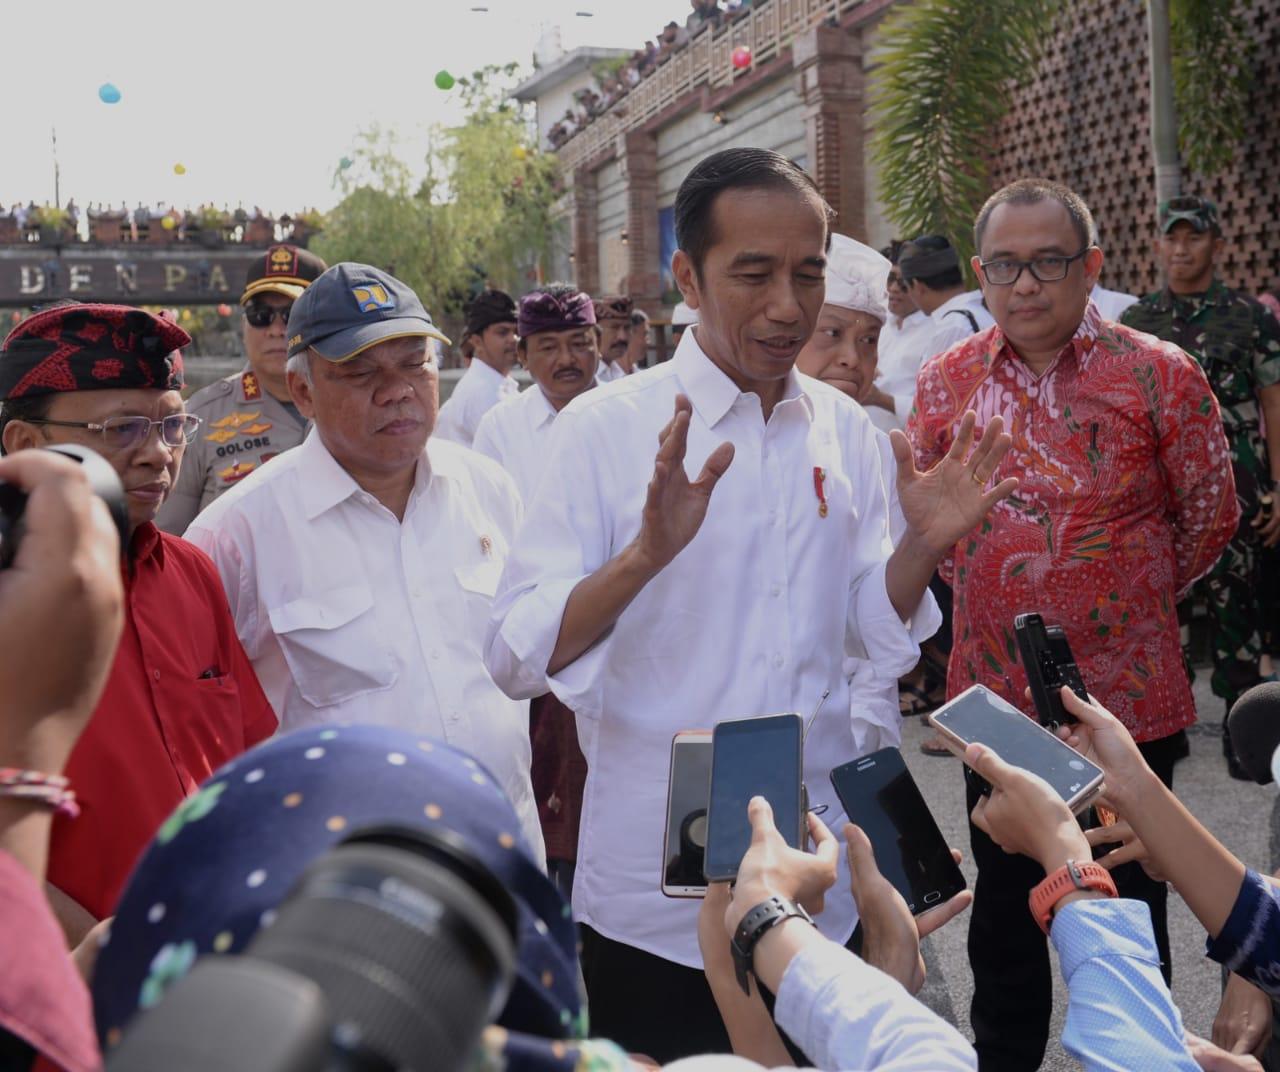 Hari Kedua di Bali, Presiden Tinjau Pasar Badung